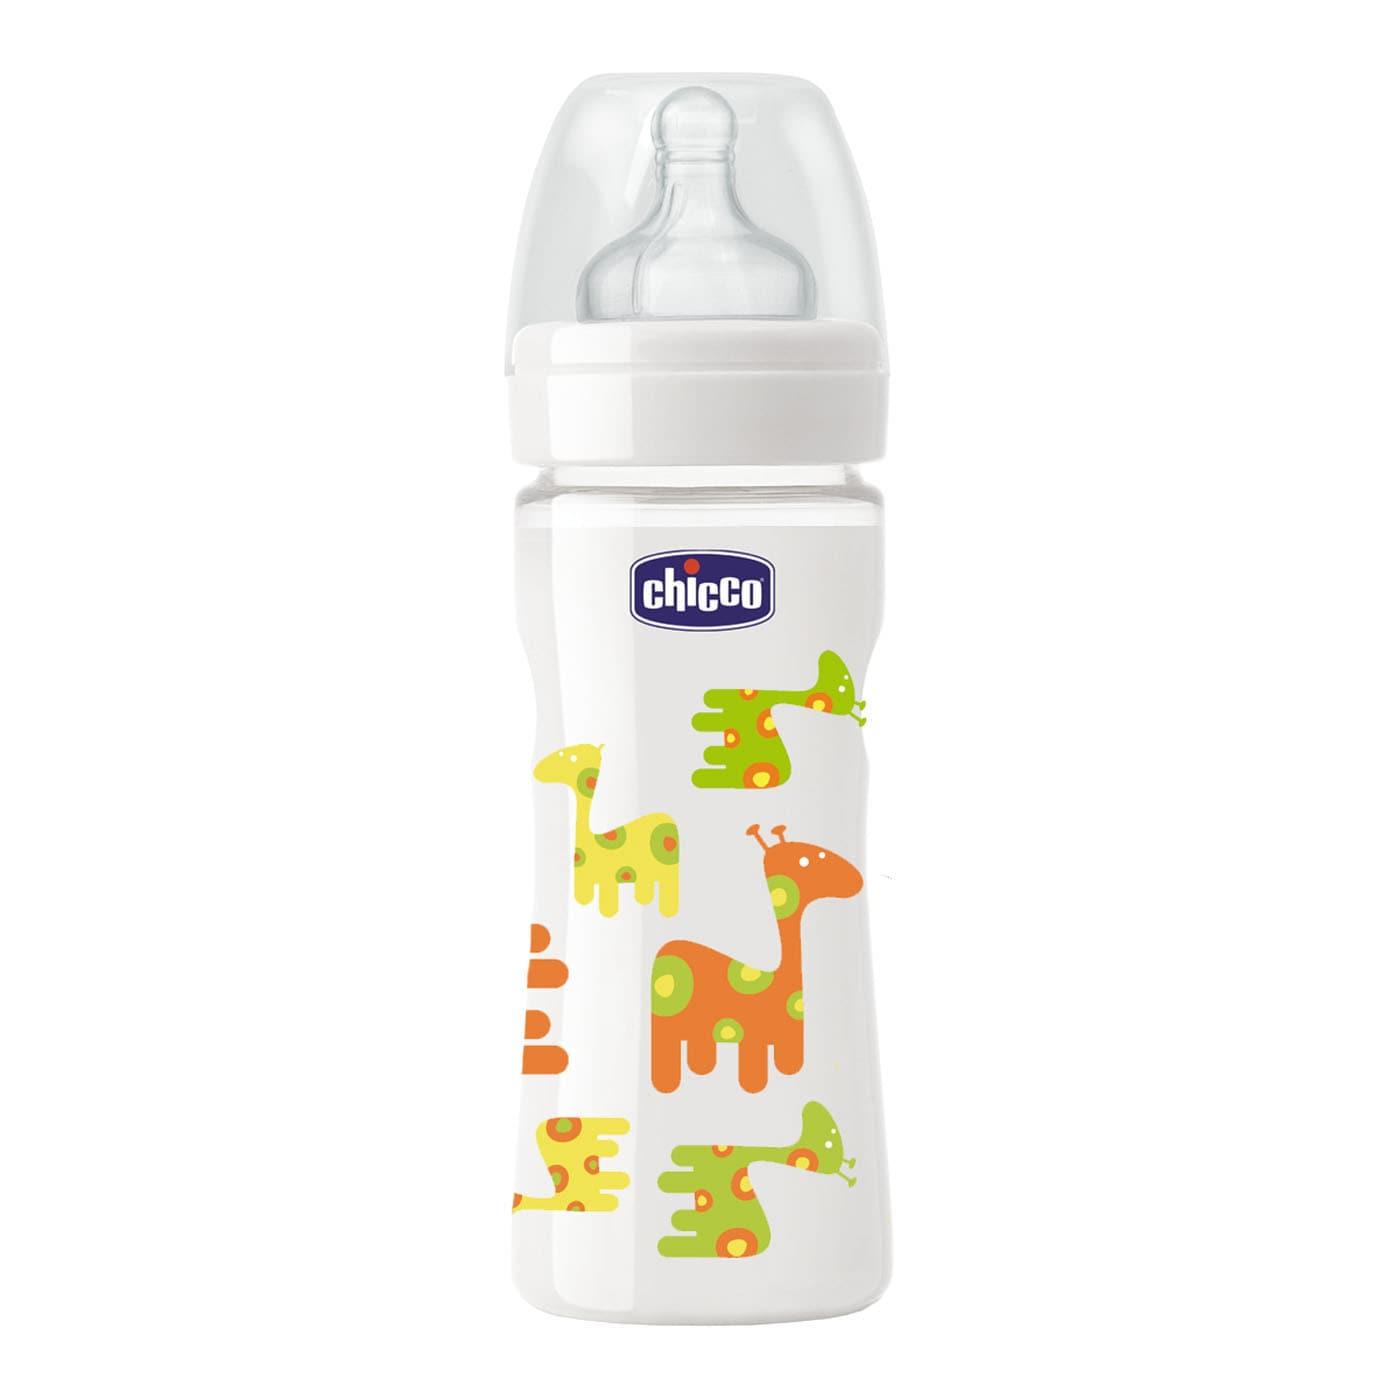 Chicco Nature Glass Well Being 0m+ - Giraff, Γυάλινο μπιμπερό κανονικής ροής με θηλή σιλικόνης, 0% BPA, 240ml